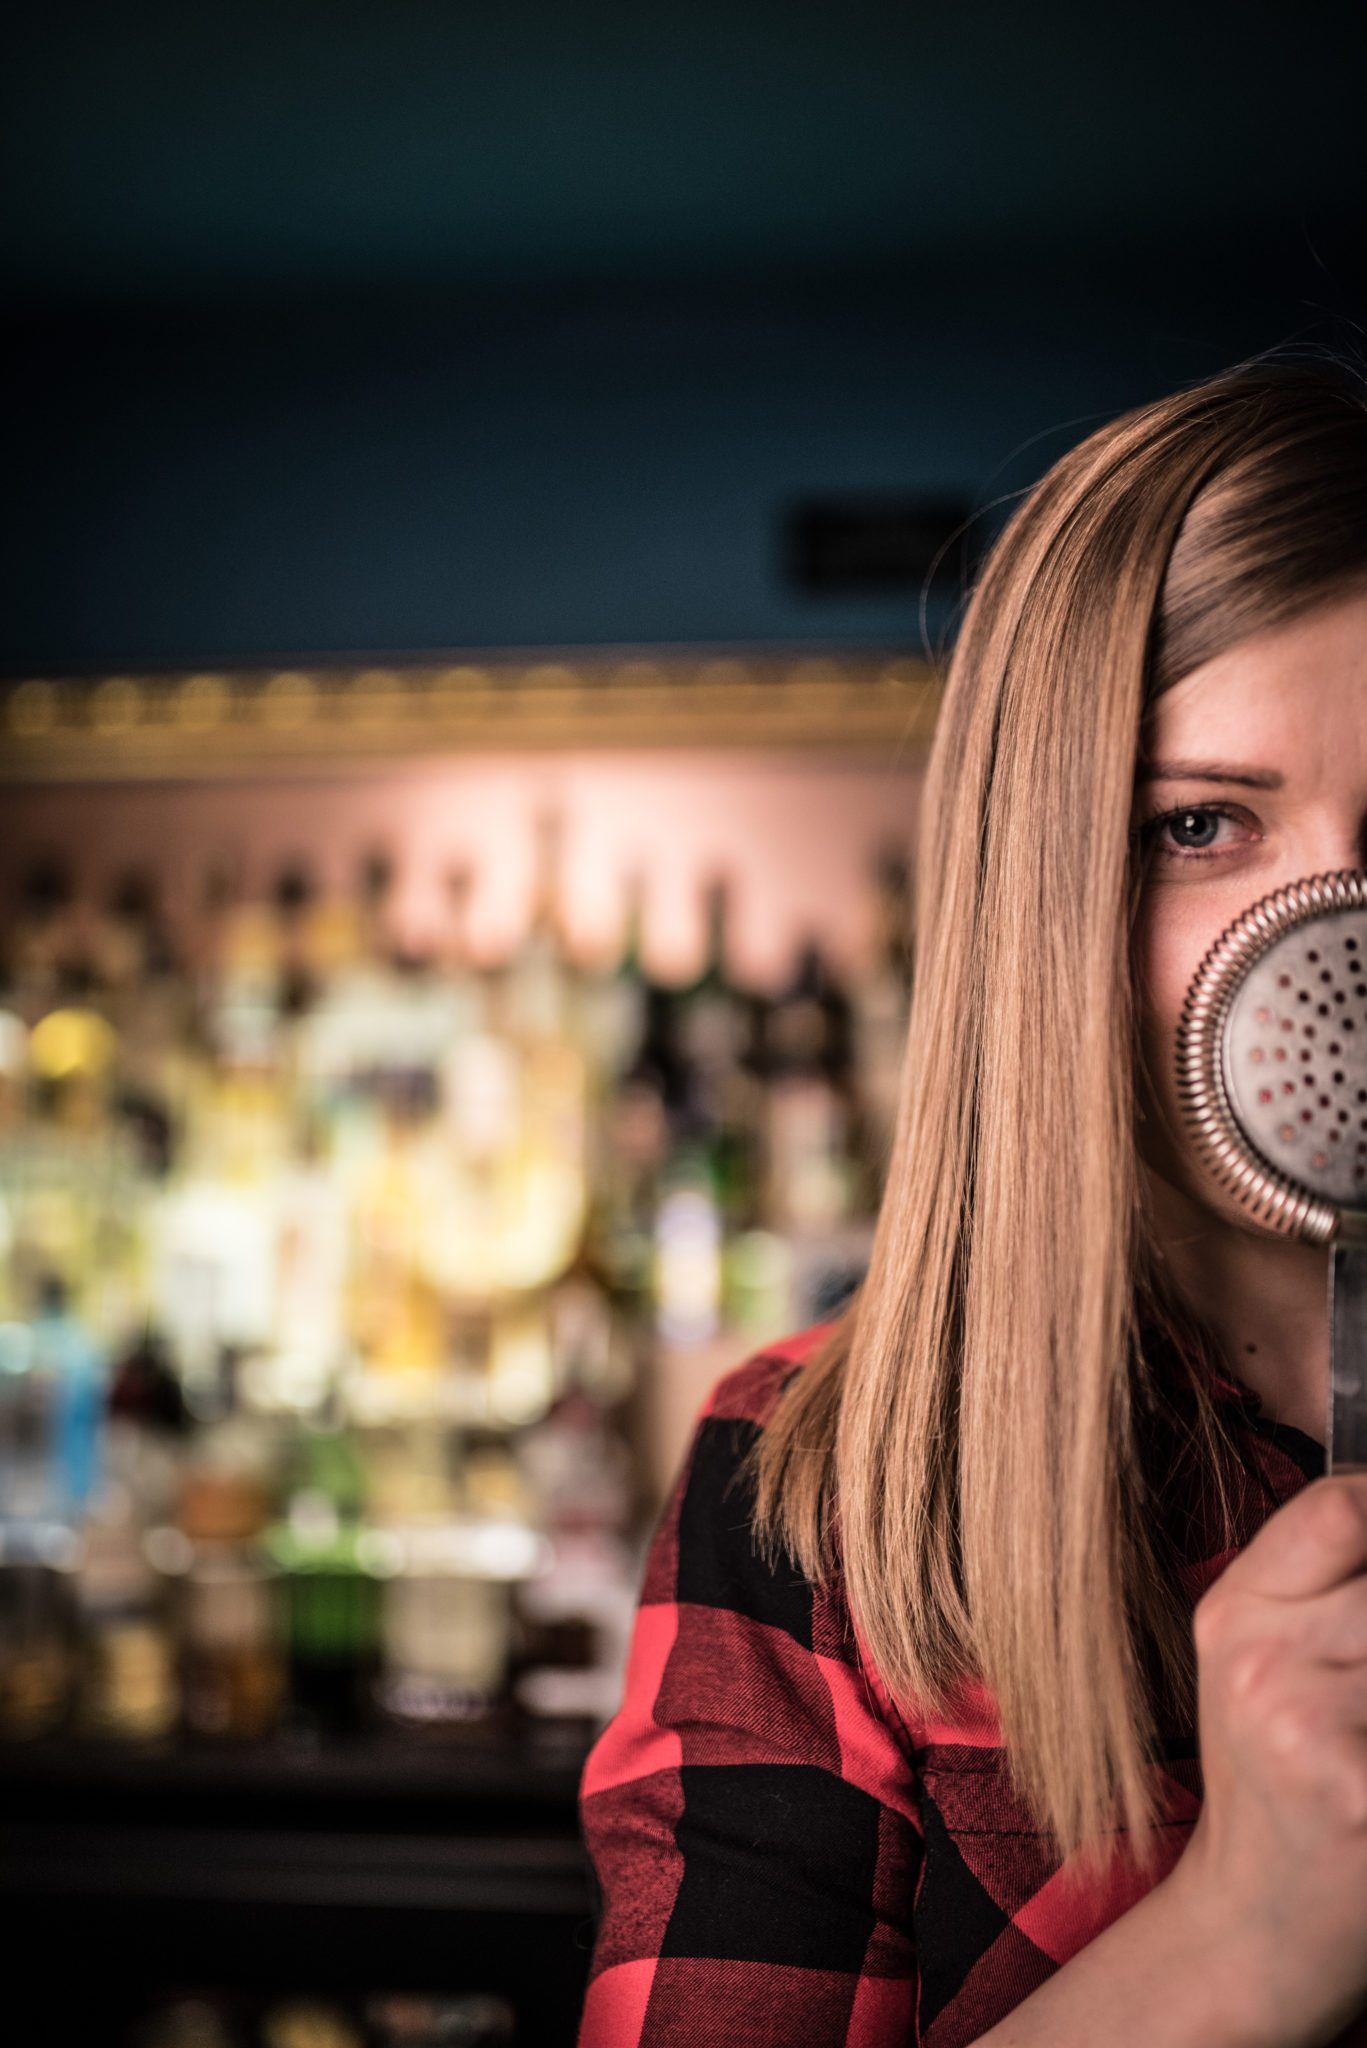 pl mo anita oltuszyk shift 2 bcb barkeeper portrait